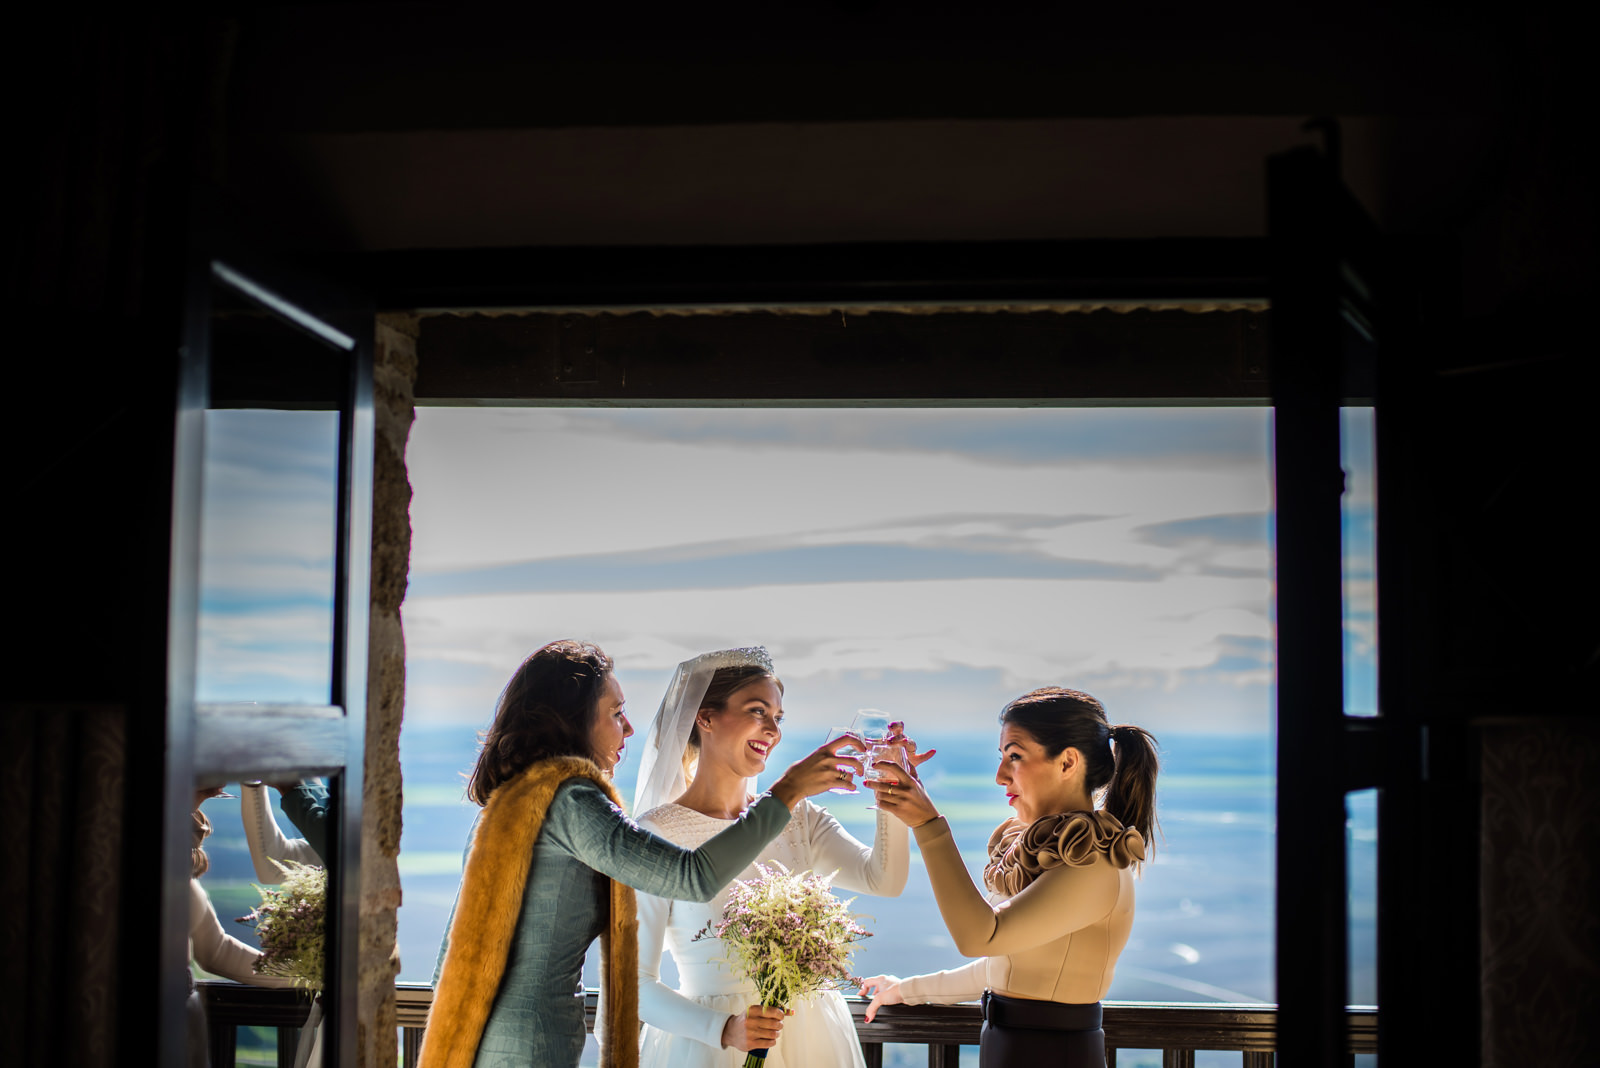 Boda-Sevilla-Parador-Carmona-bridal-engagement-Rafael-Torres-fotografo-bodas-sevilla-madrid-barcelona-wedding-photographer--30.jpg